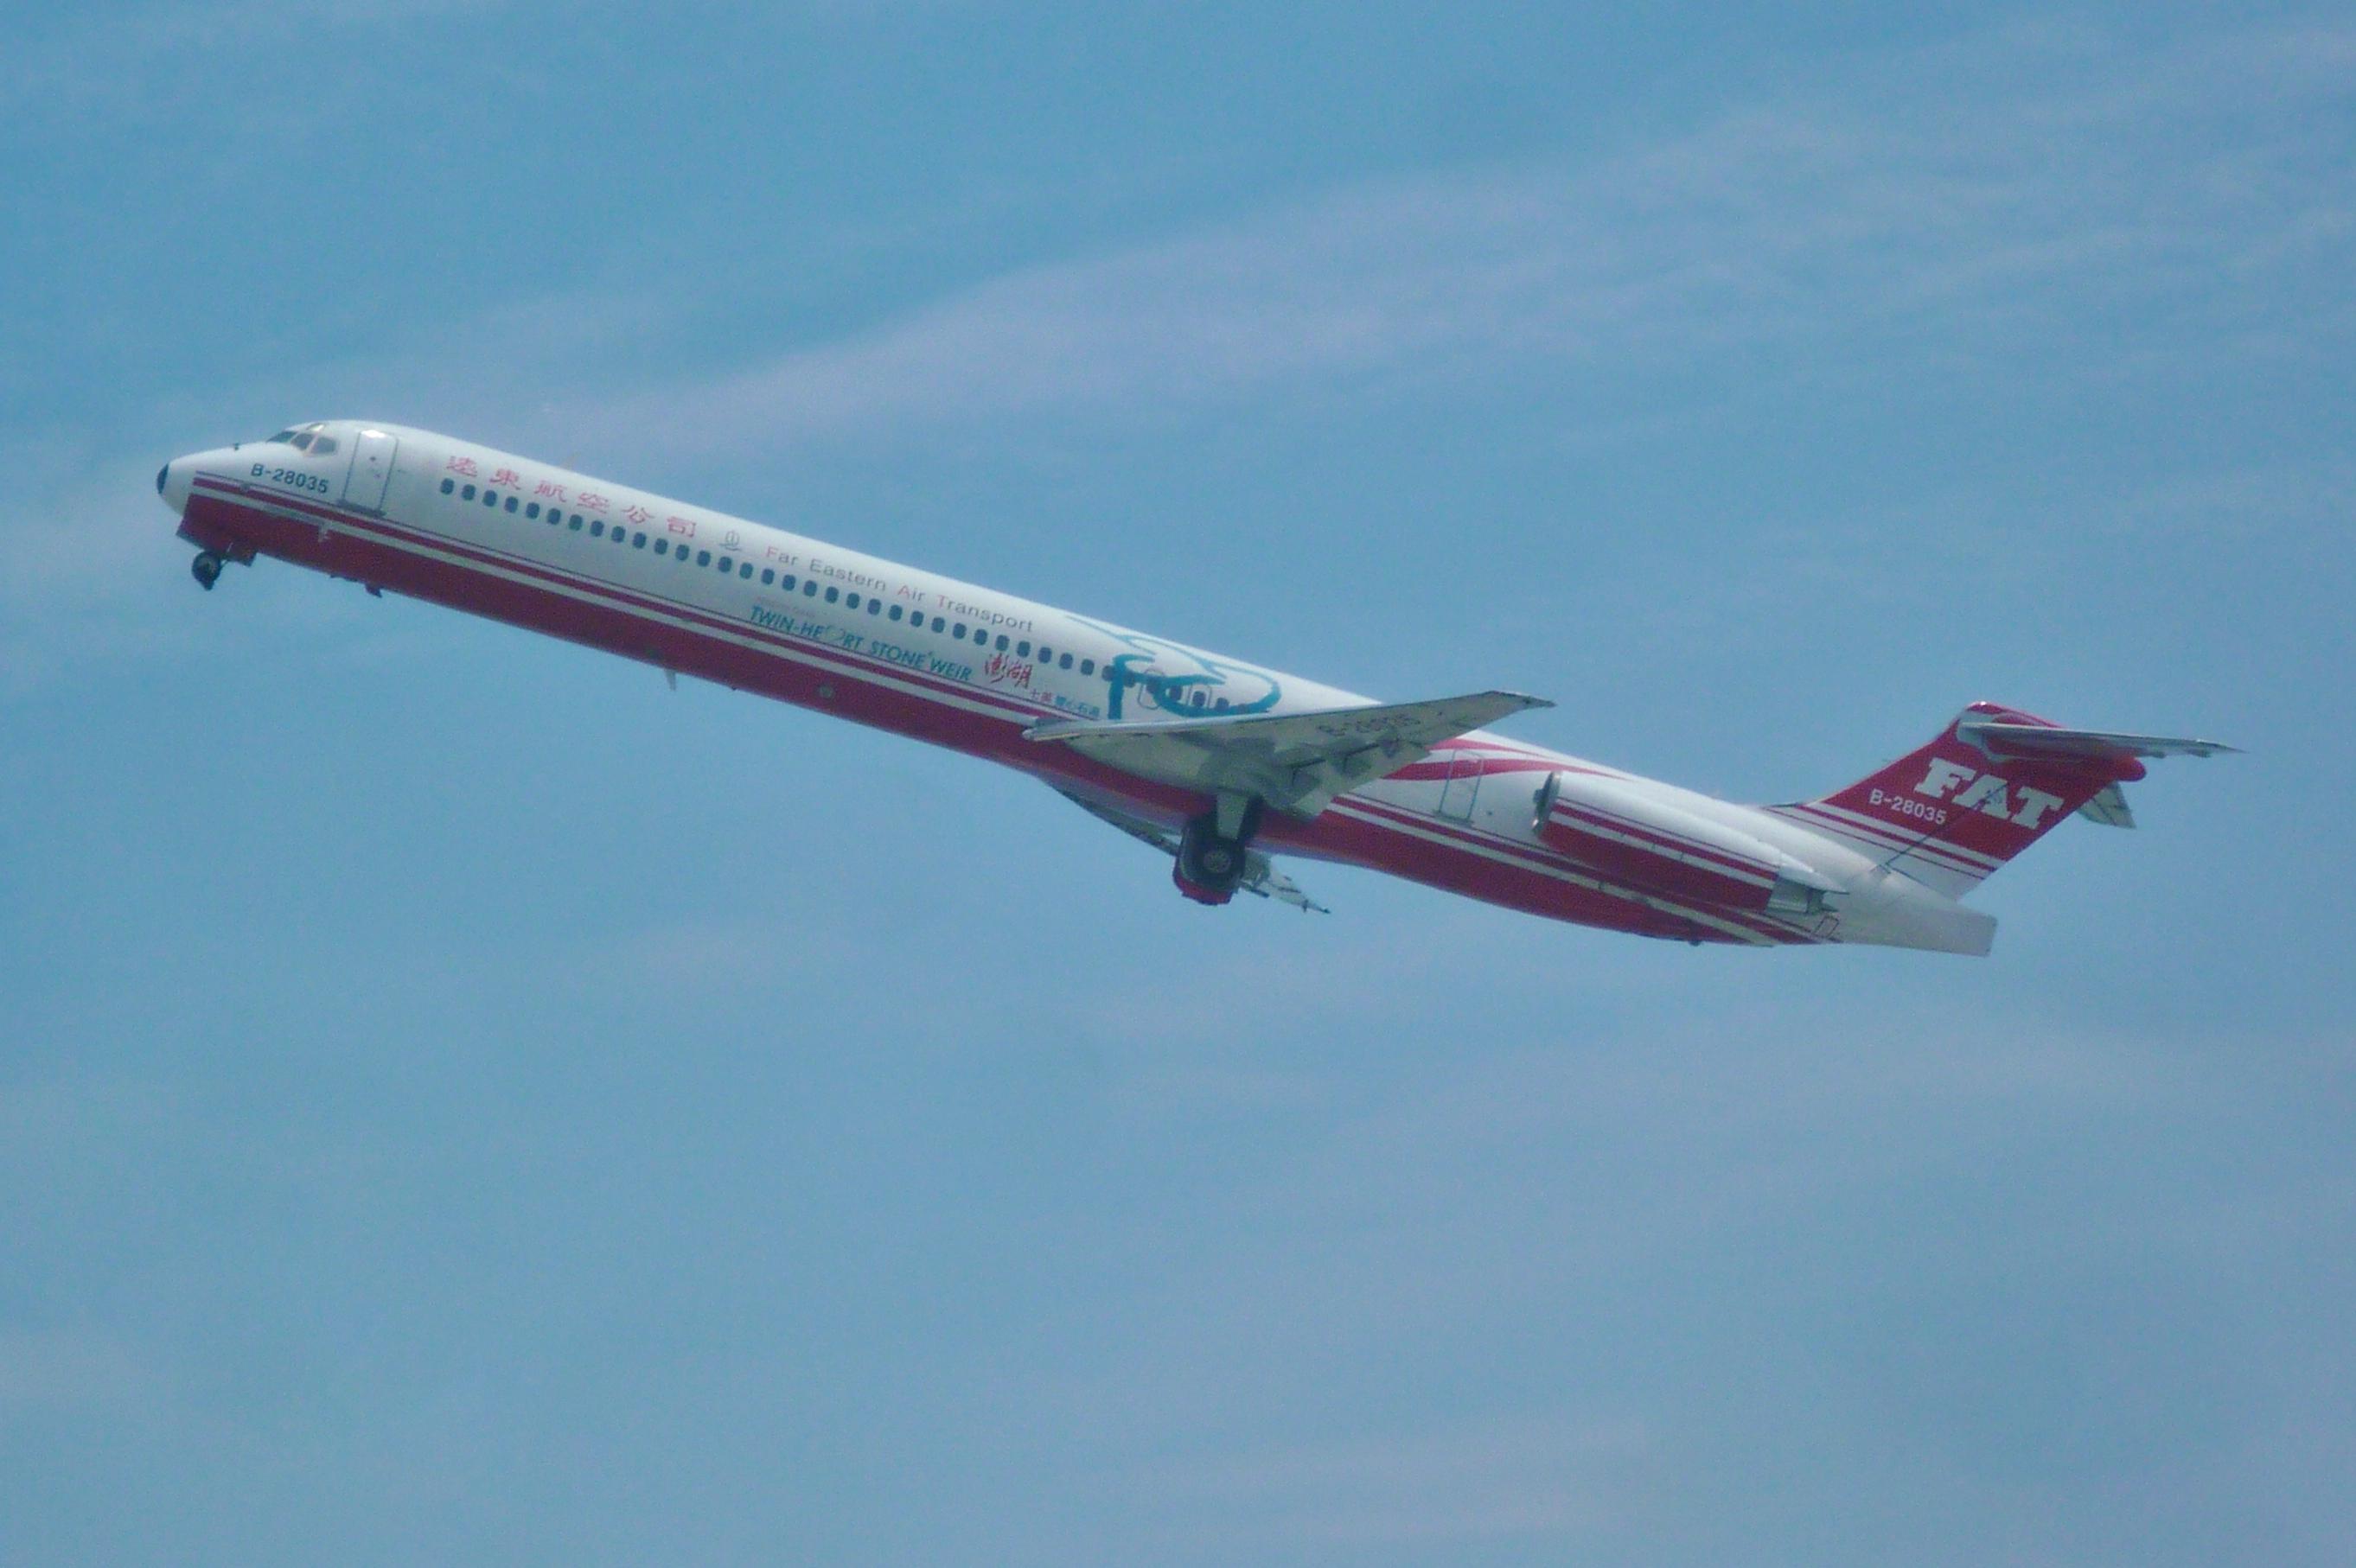 File:Far Eastern Air Transport McDonnell Douglas MD-83 B-28035 Taking off